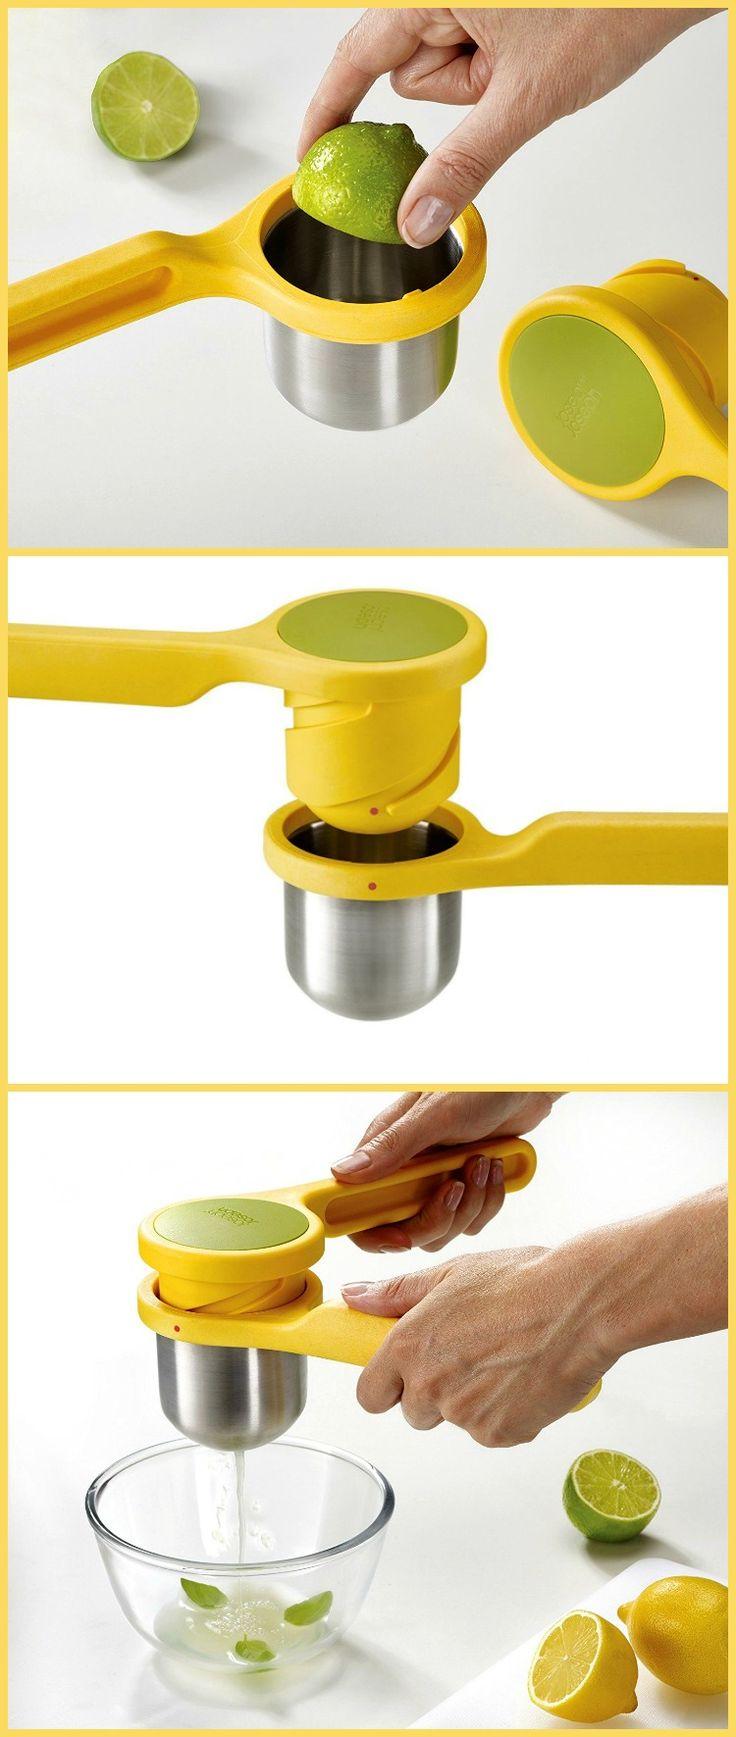 Joseph Joseph Helix Citrus Juicer. Ergonomic twist-action hand press makes juicing easier. #affiliate